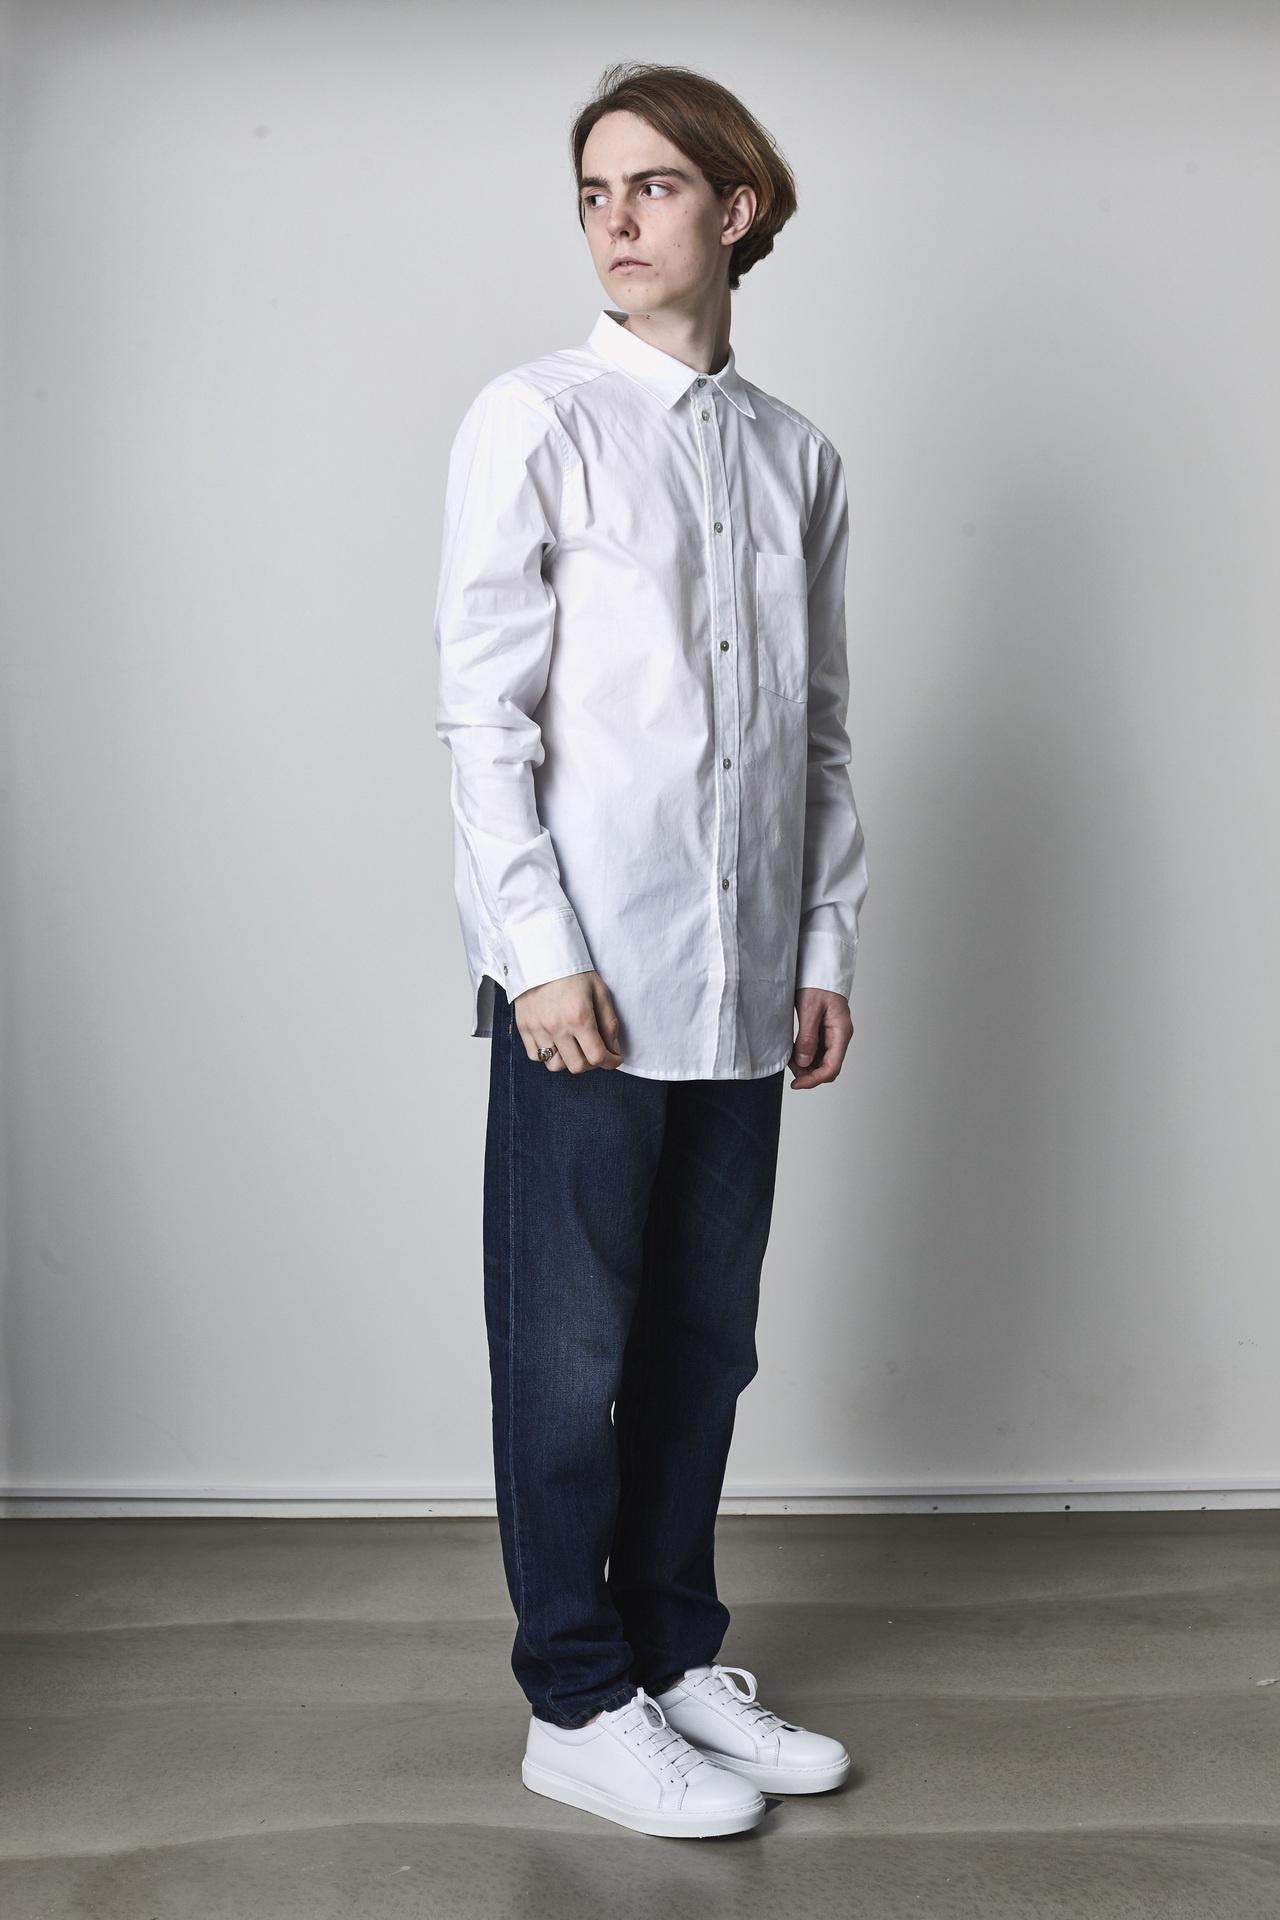 Livid Jeans - Roald - Modest Fade Image